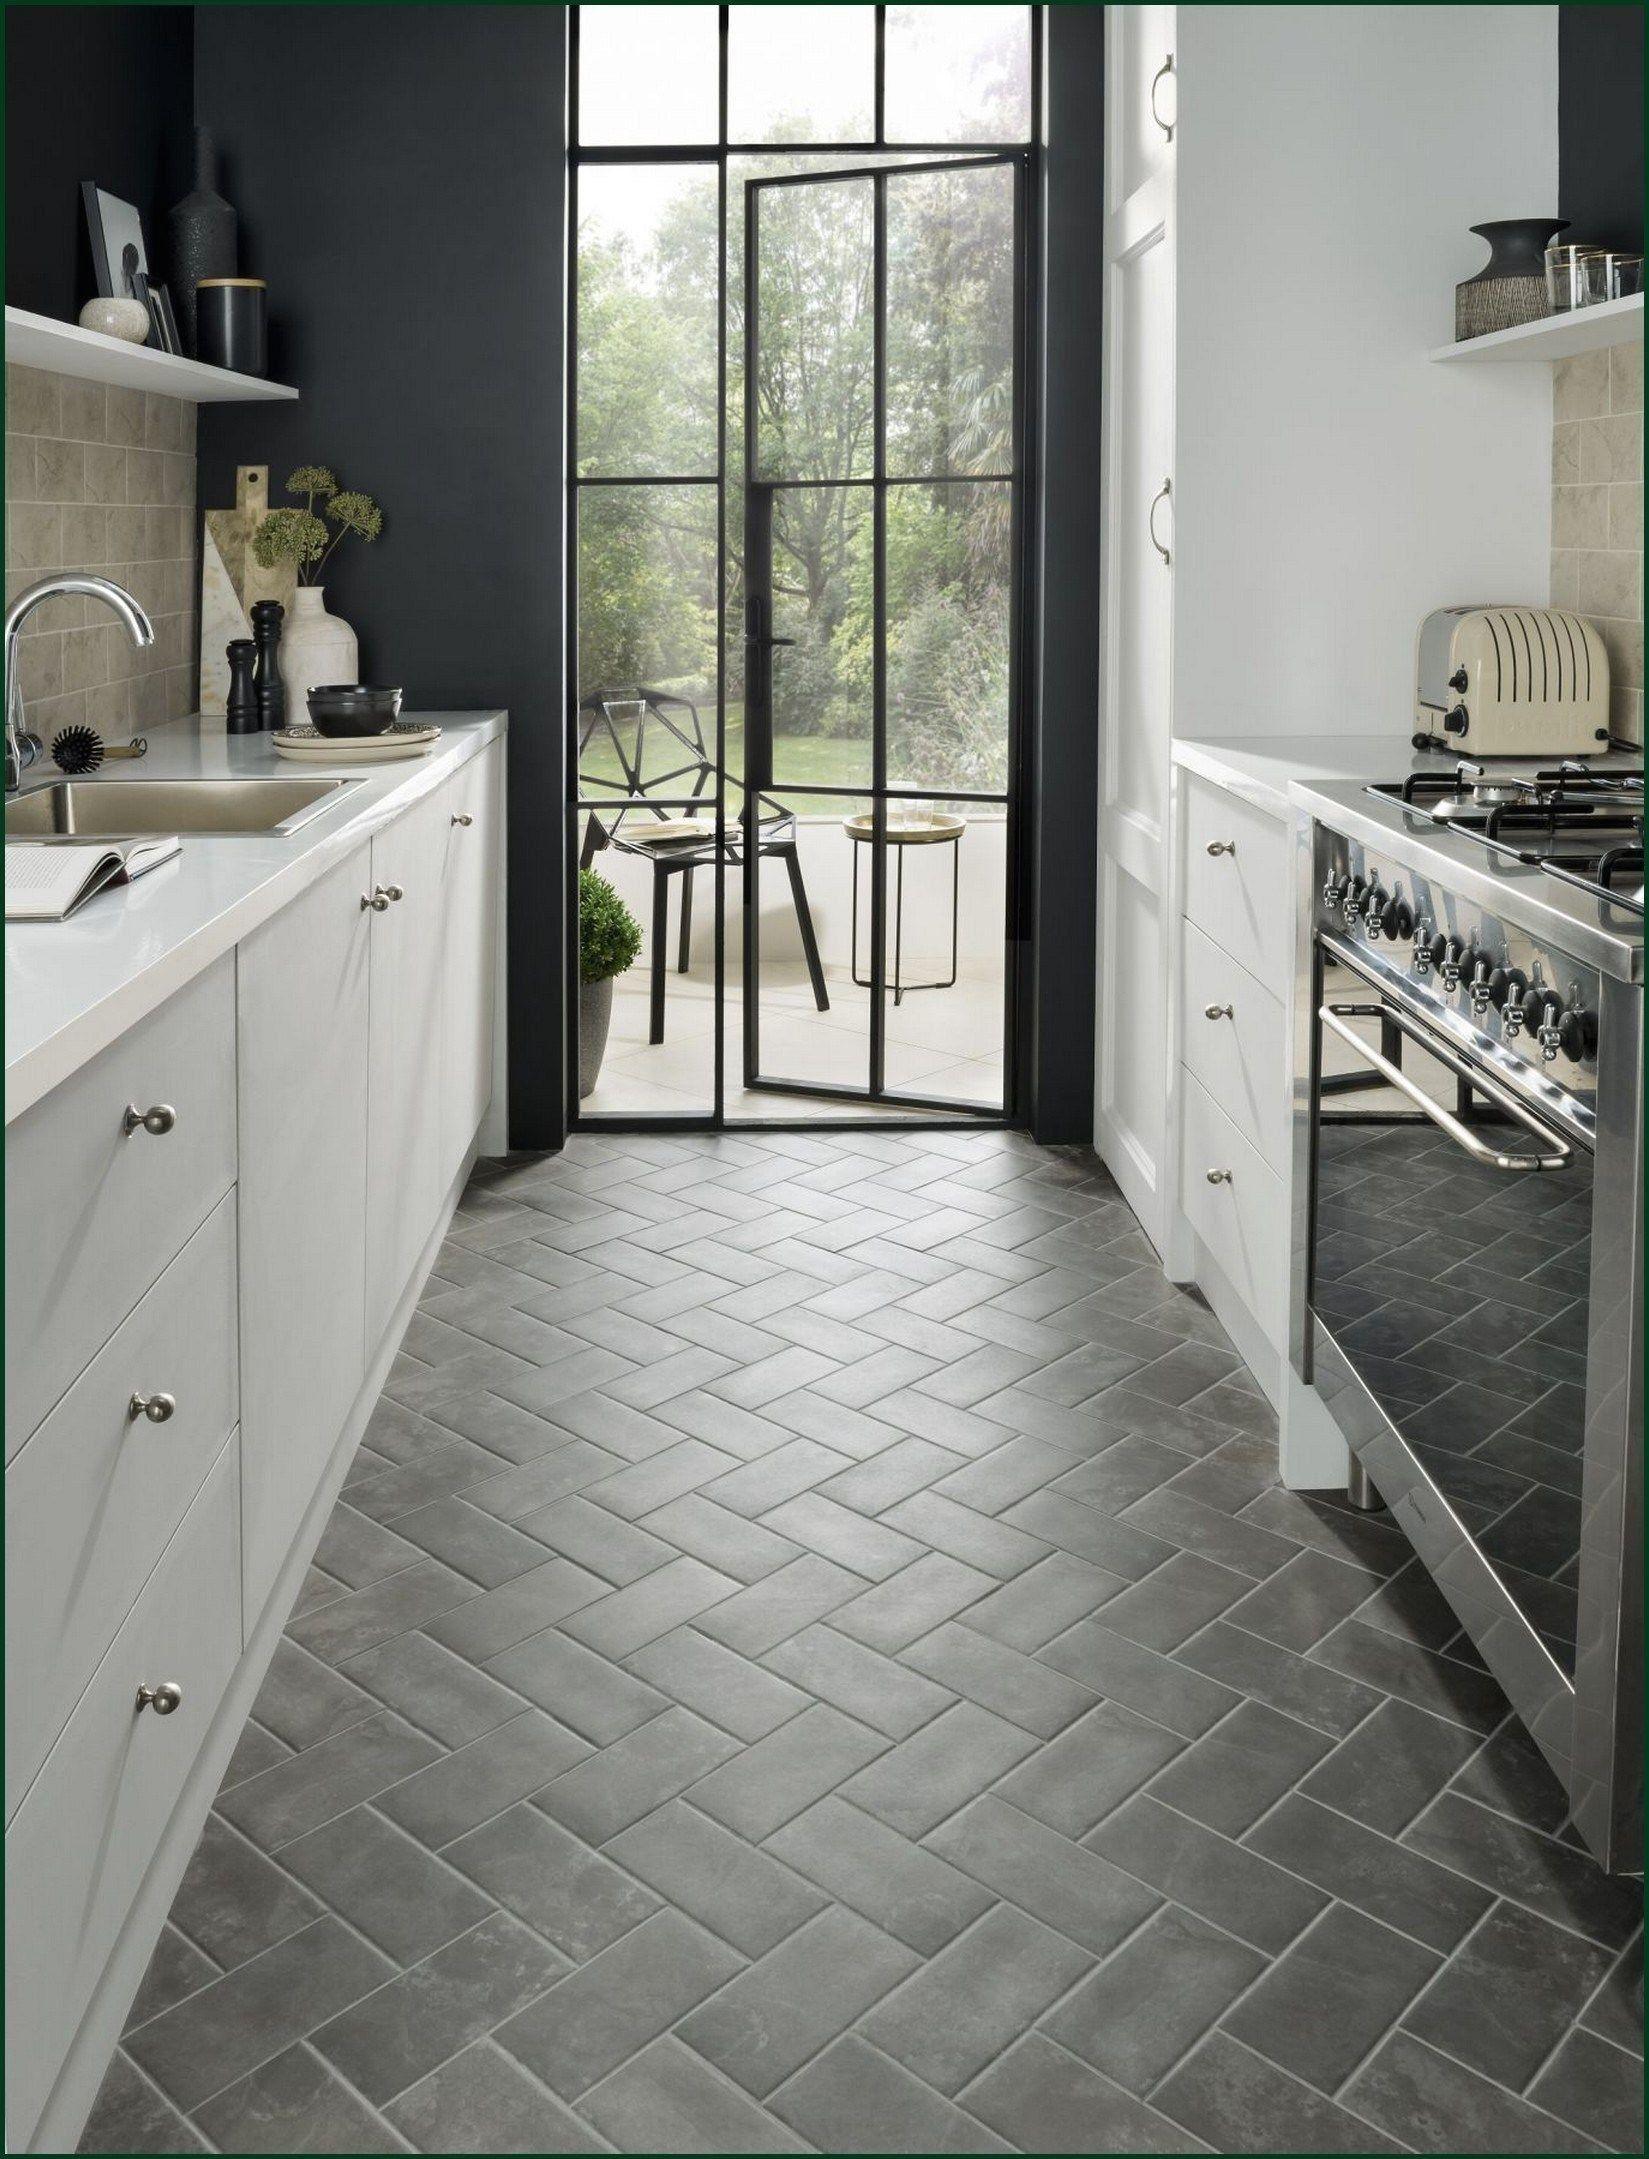 Kitchen Floor Tile (Retro, Commercial, Marble Kitchen